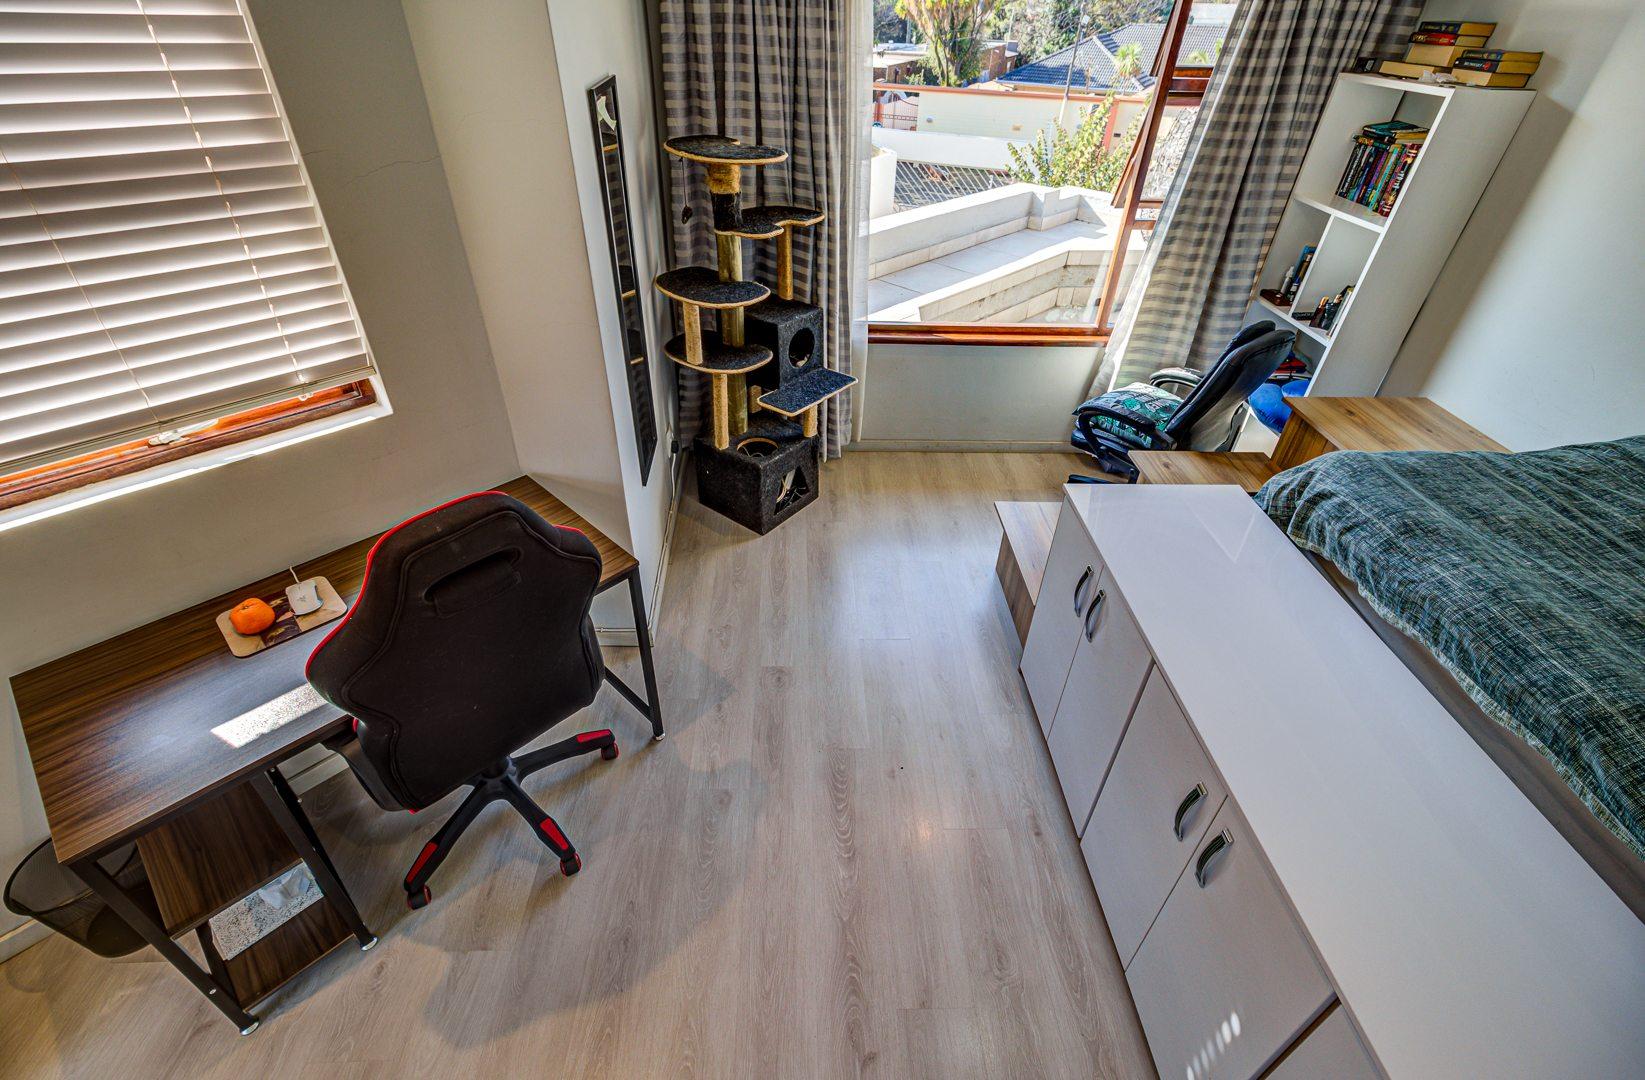 3 Bedroom House For Sale in Bedfordview